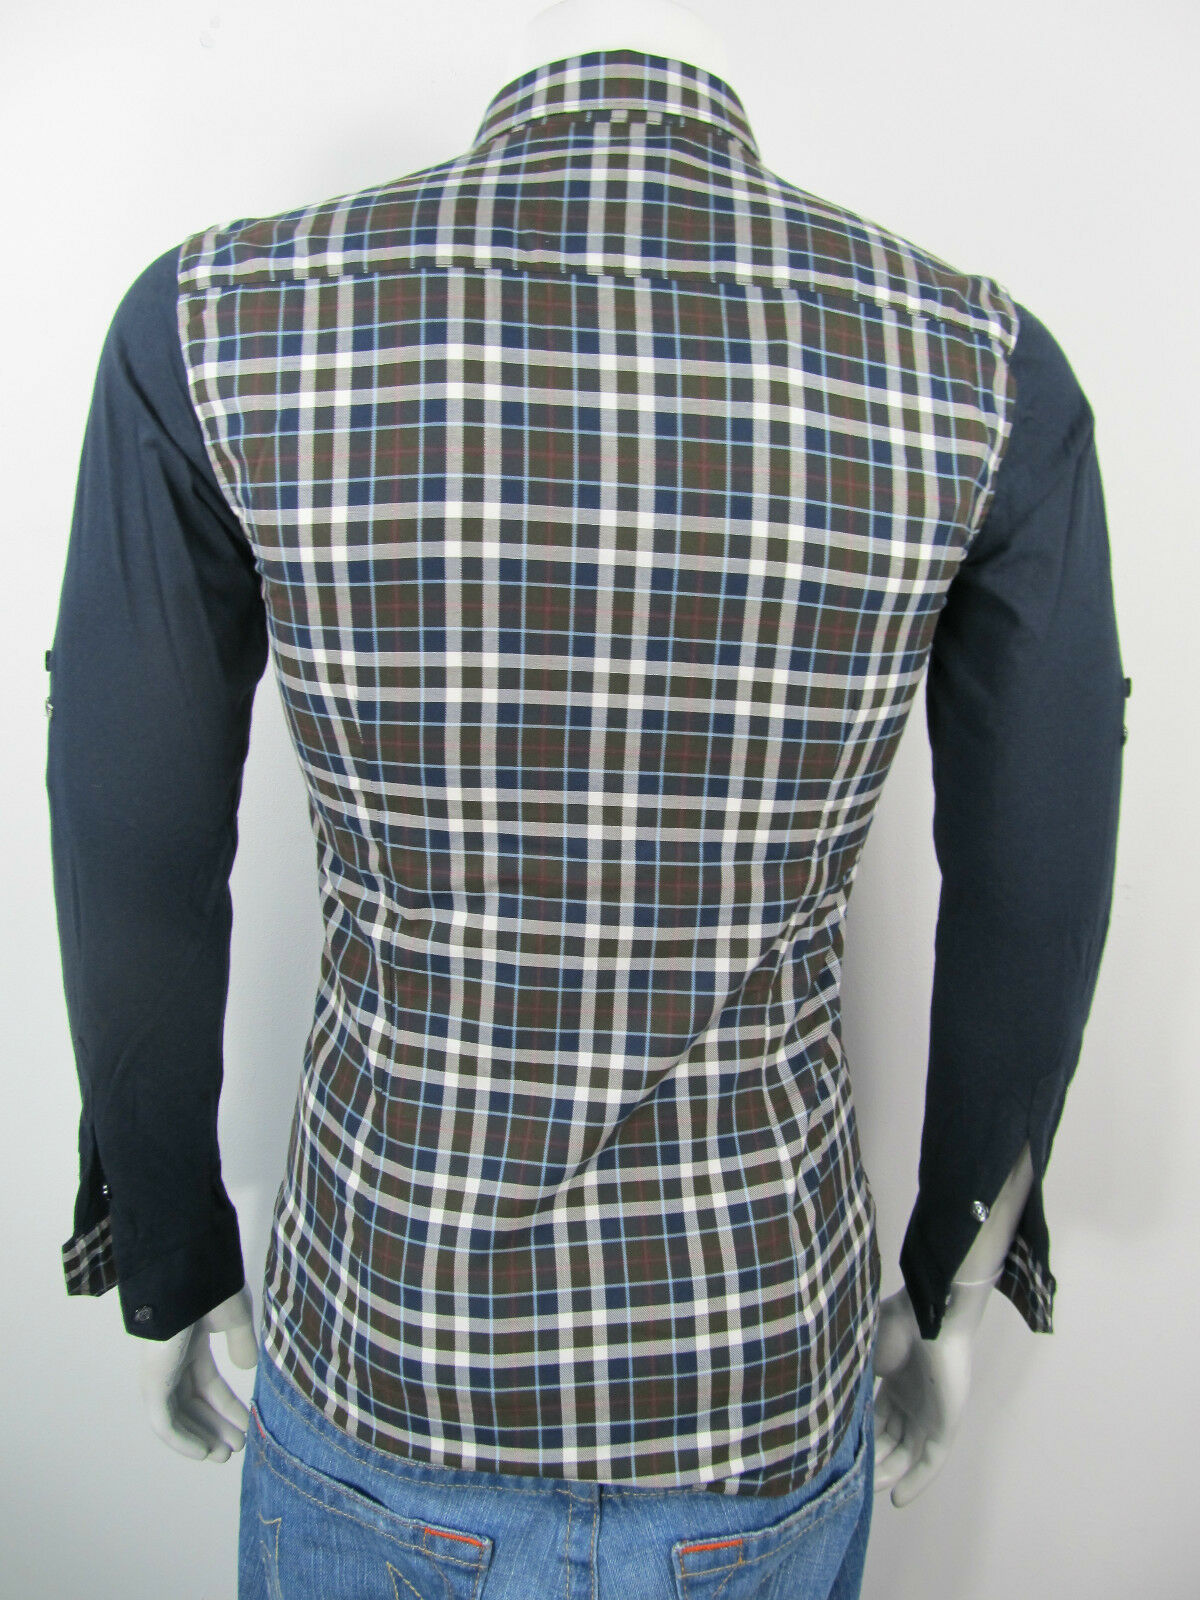 Bogosse Billy Bob blu Long Sleeve Shirt Button Front Front Button Linen Size 3 Medium M Nuovo 78c8e5